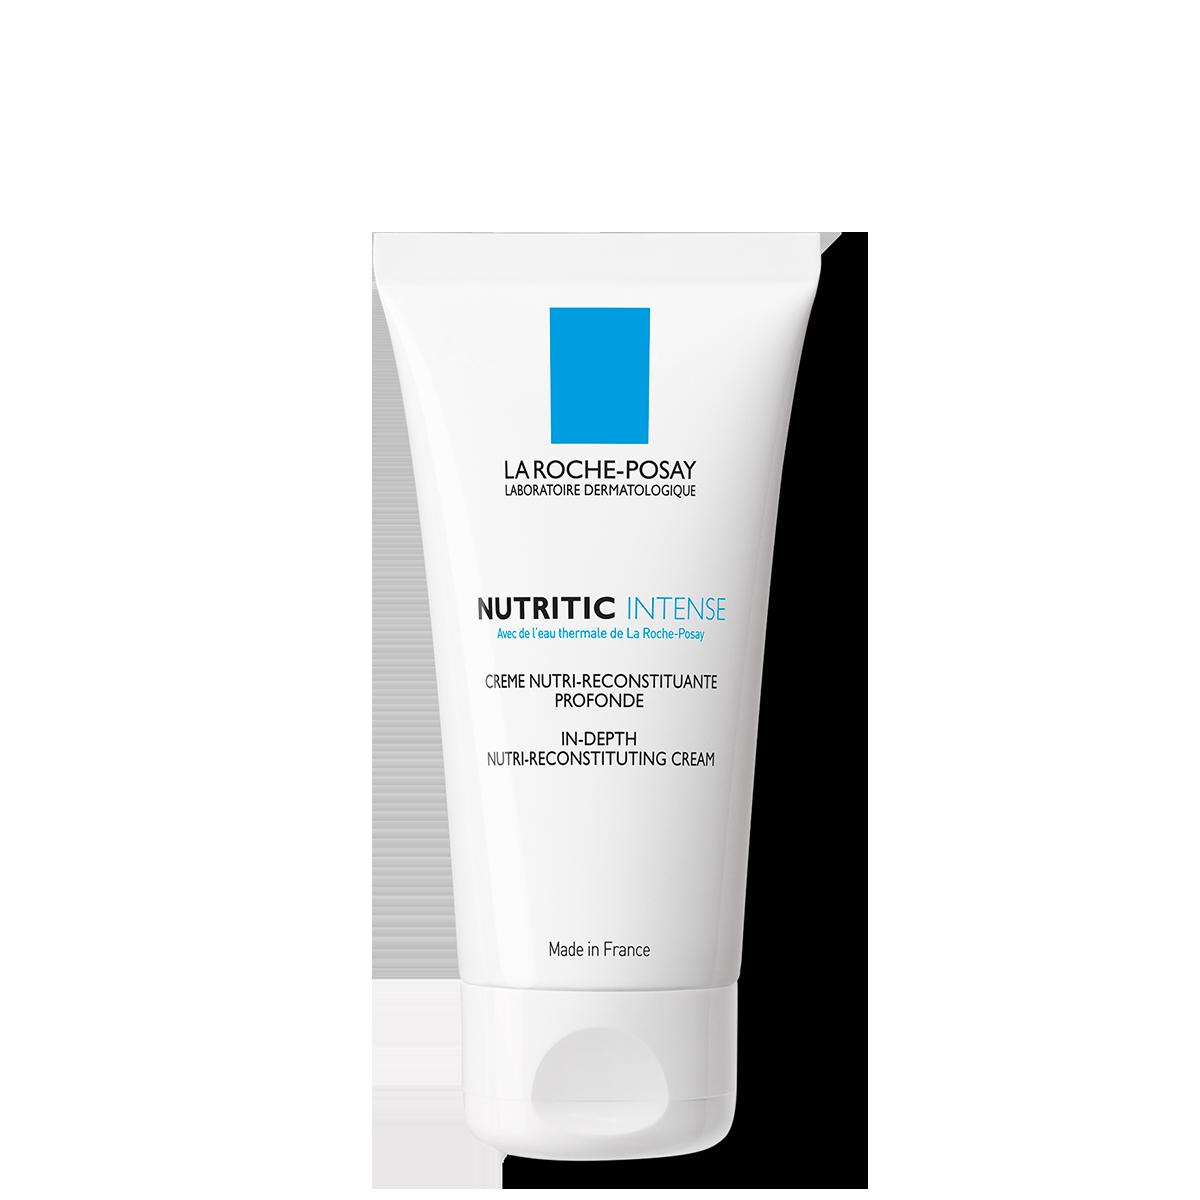 La roche posay nutritic intense NUTRITIC INTENSE 50 ml Tył | La Roche Posay